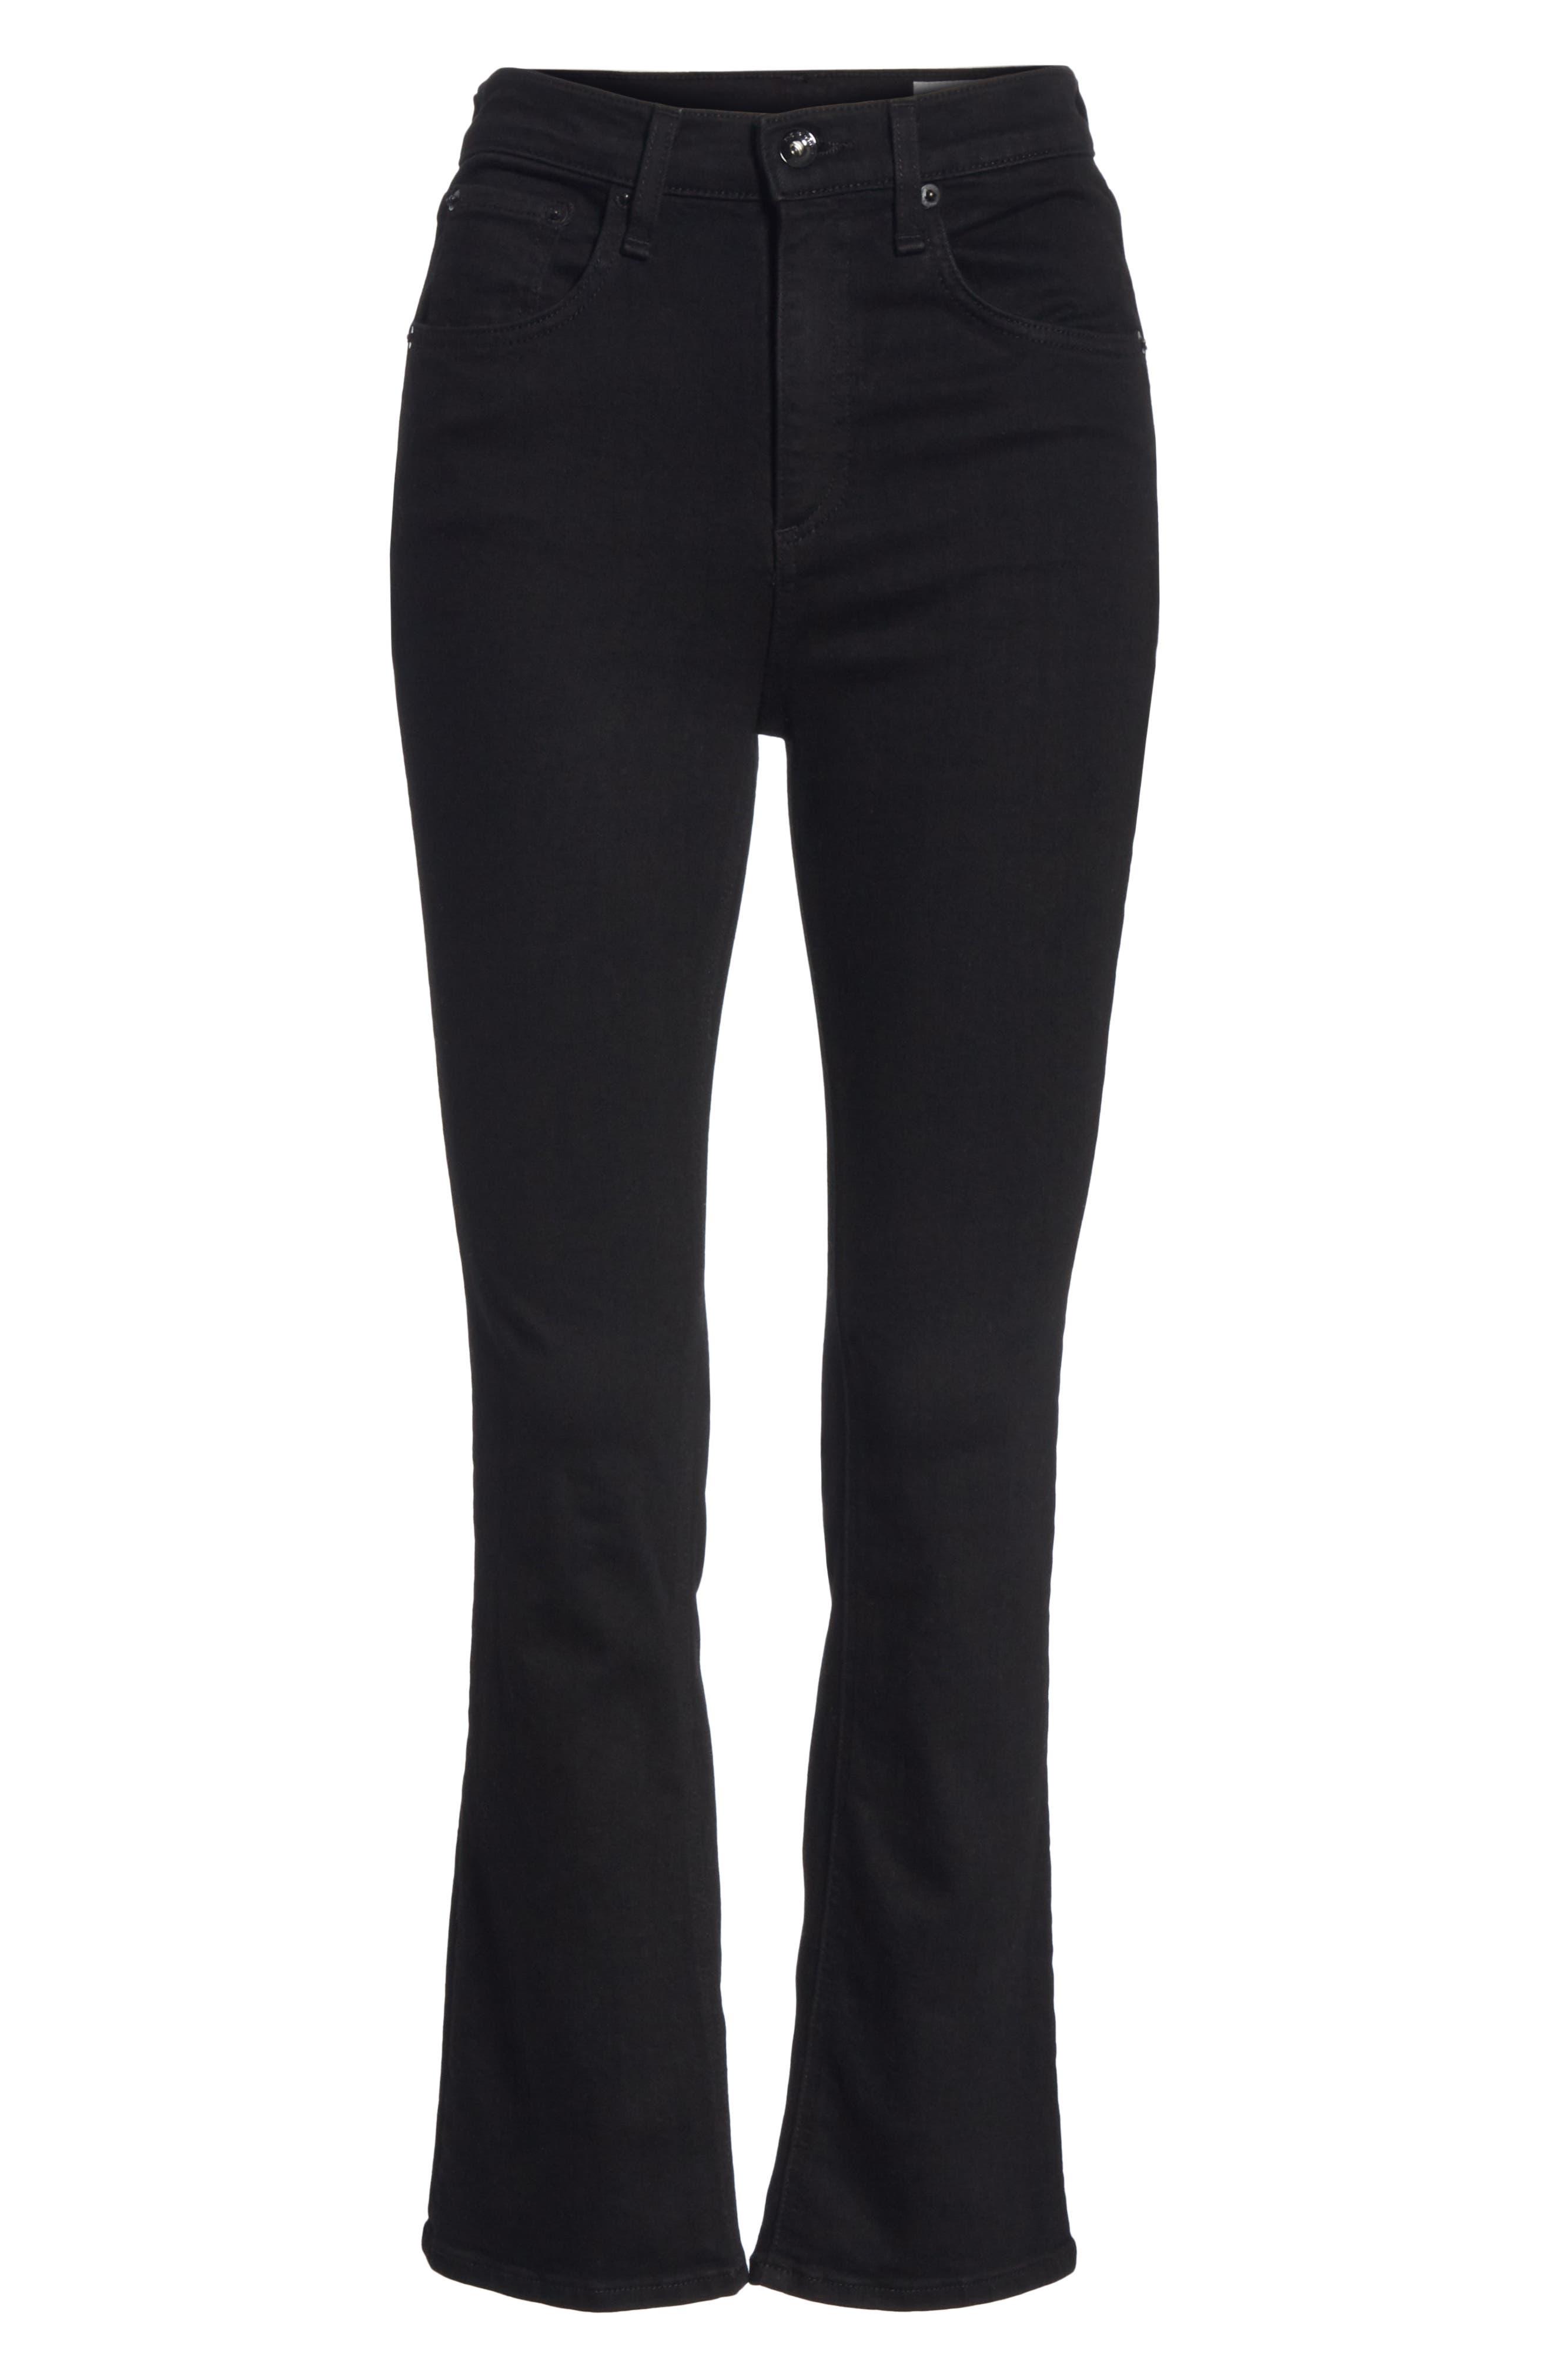 RAG & BONE,                             Hana High Waist Ankle Flare Jeans,                             Alternate thumbnail 6, color,                             001